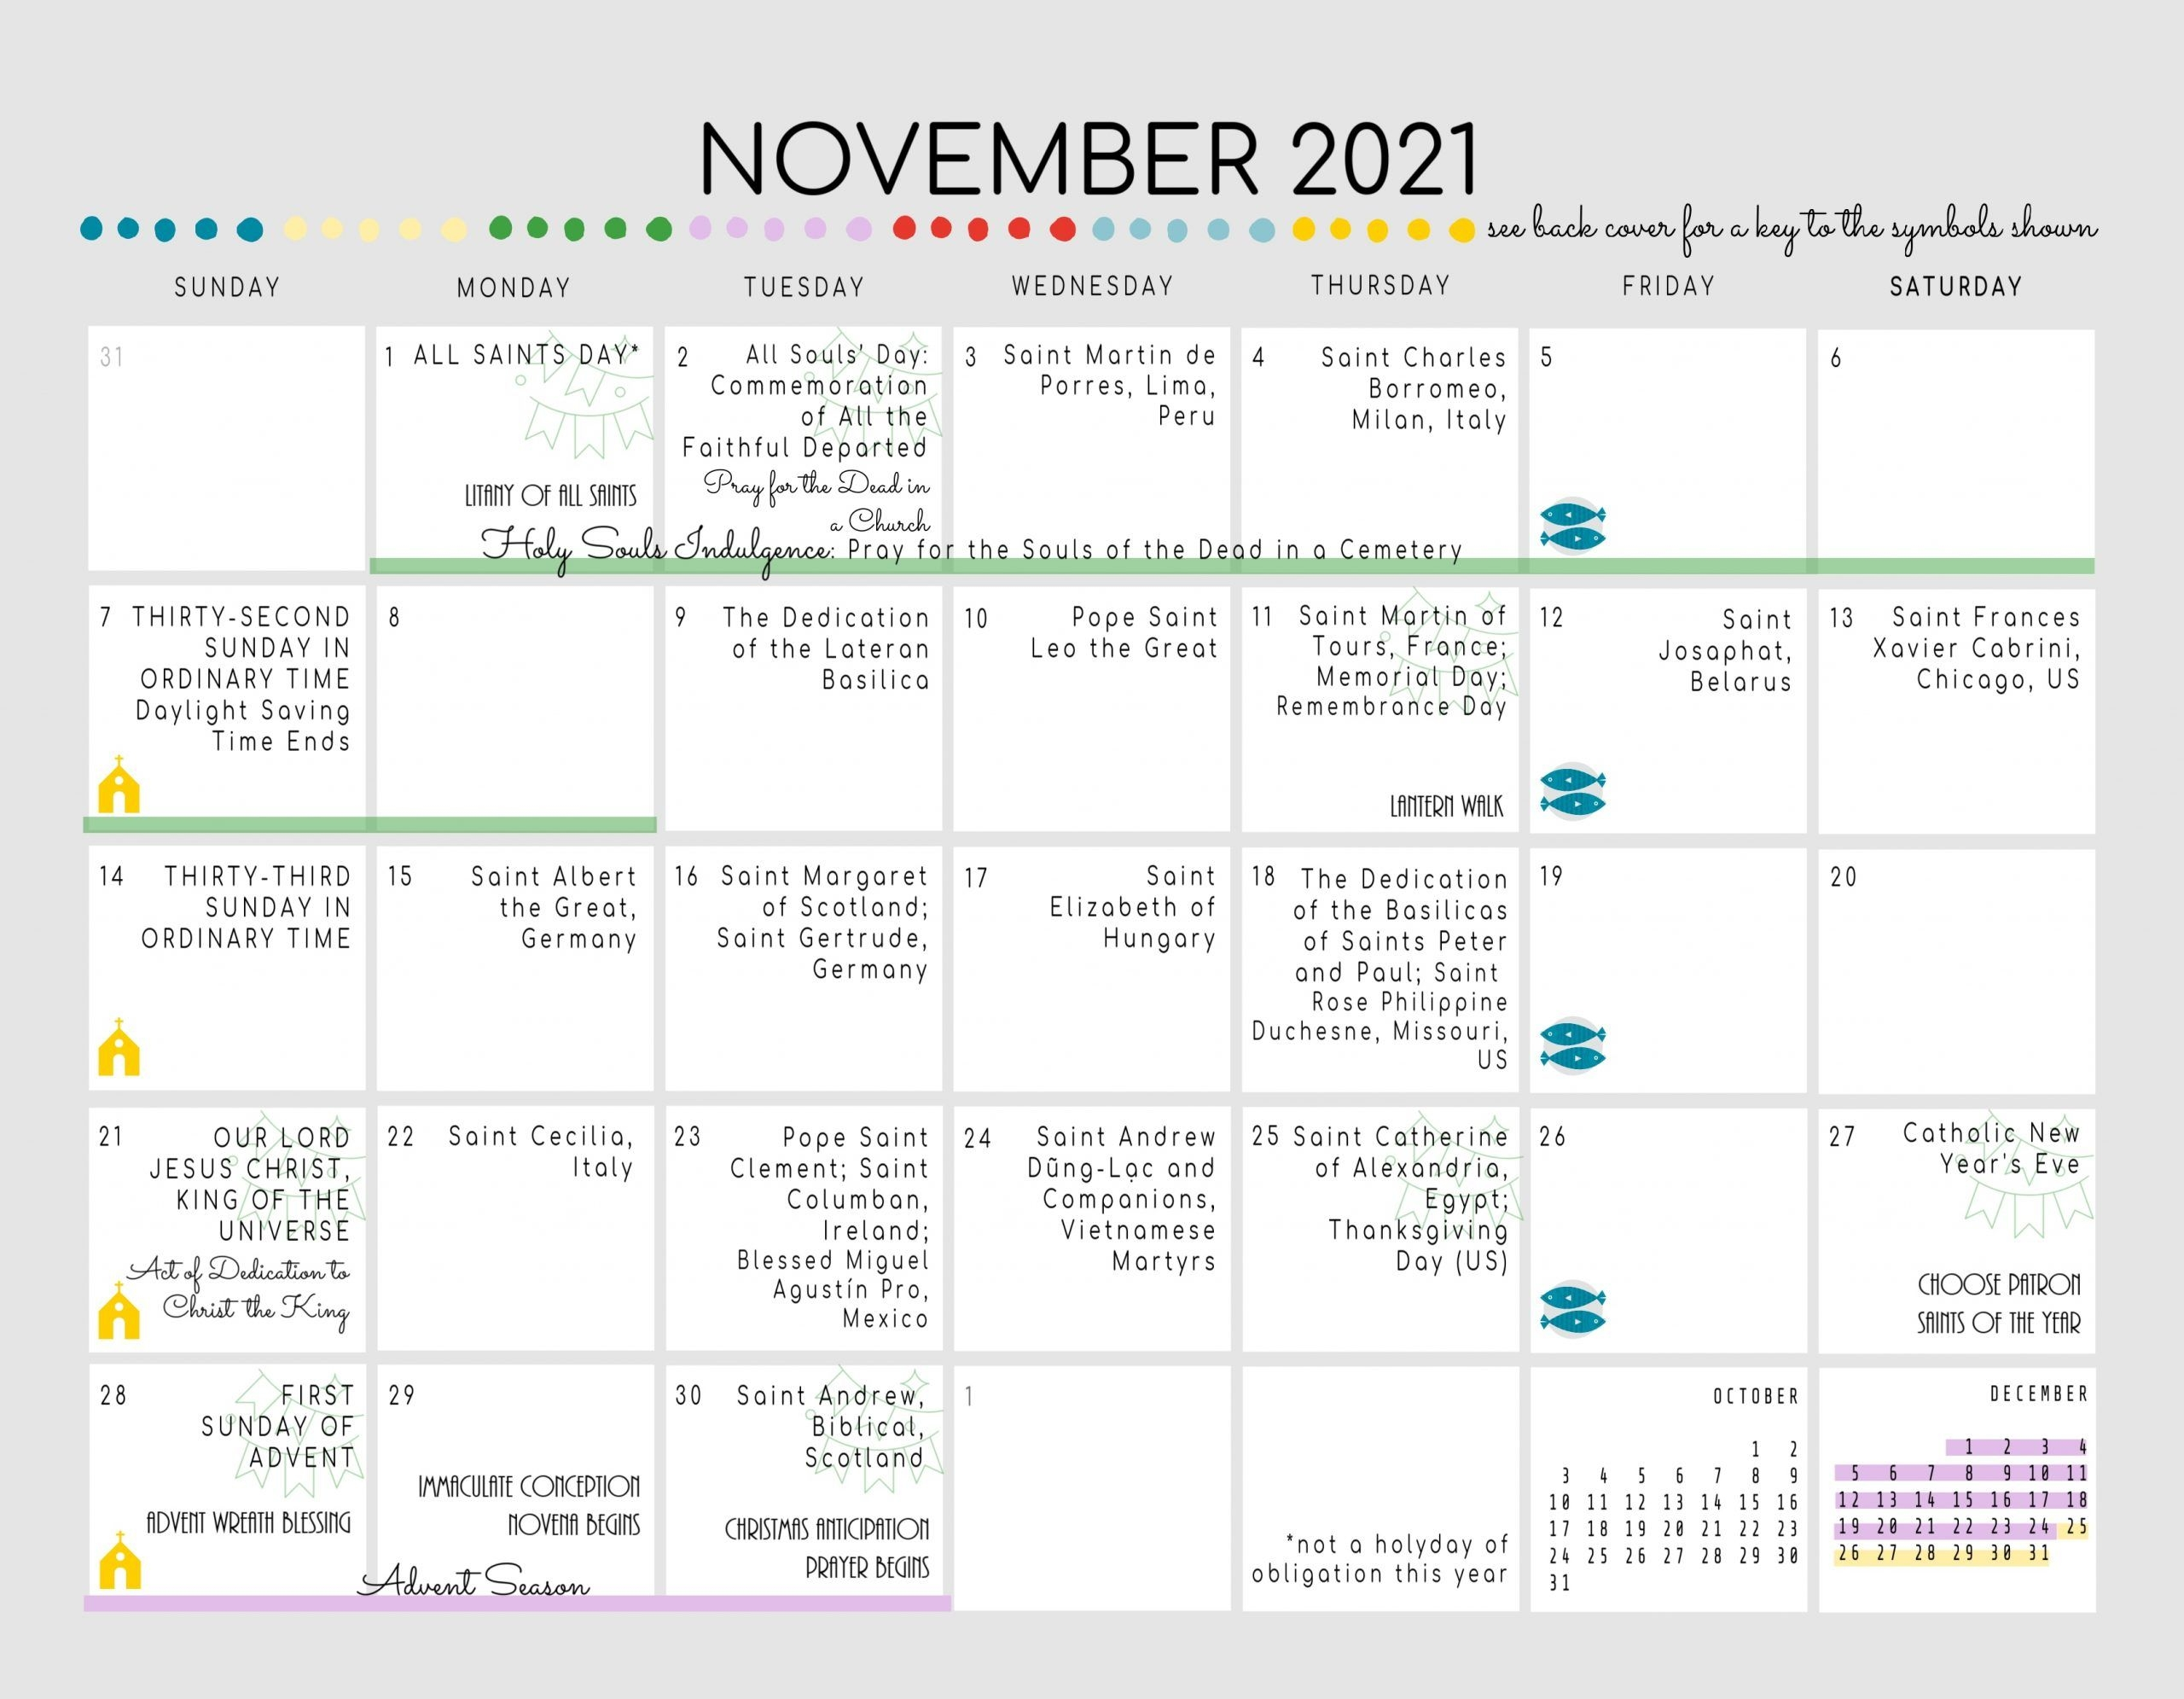 Catholic All Year 2021 Liturgical Calendar With Prayer Art *Digital  Download*